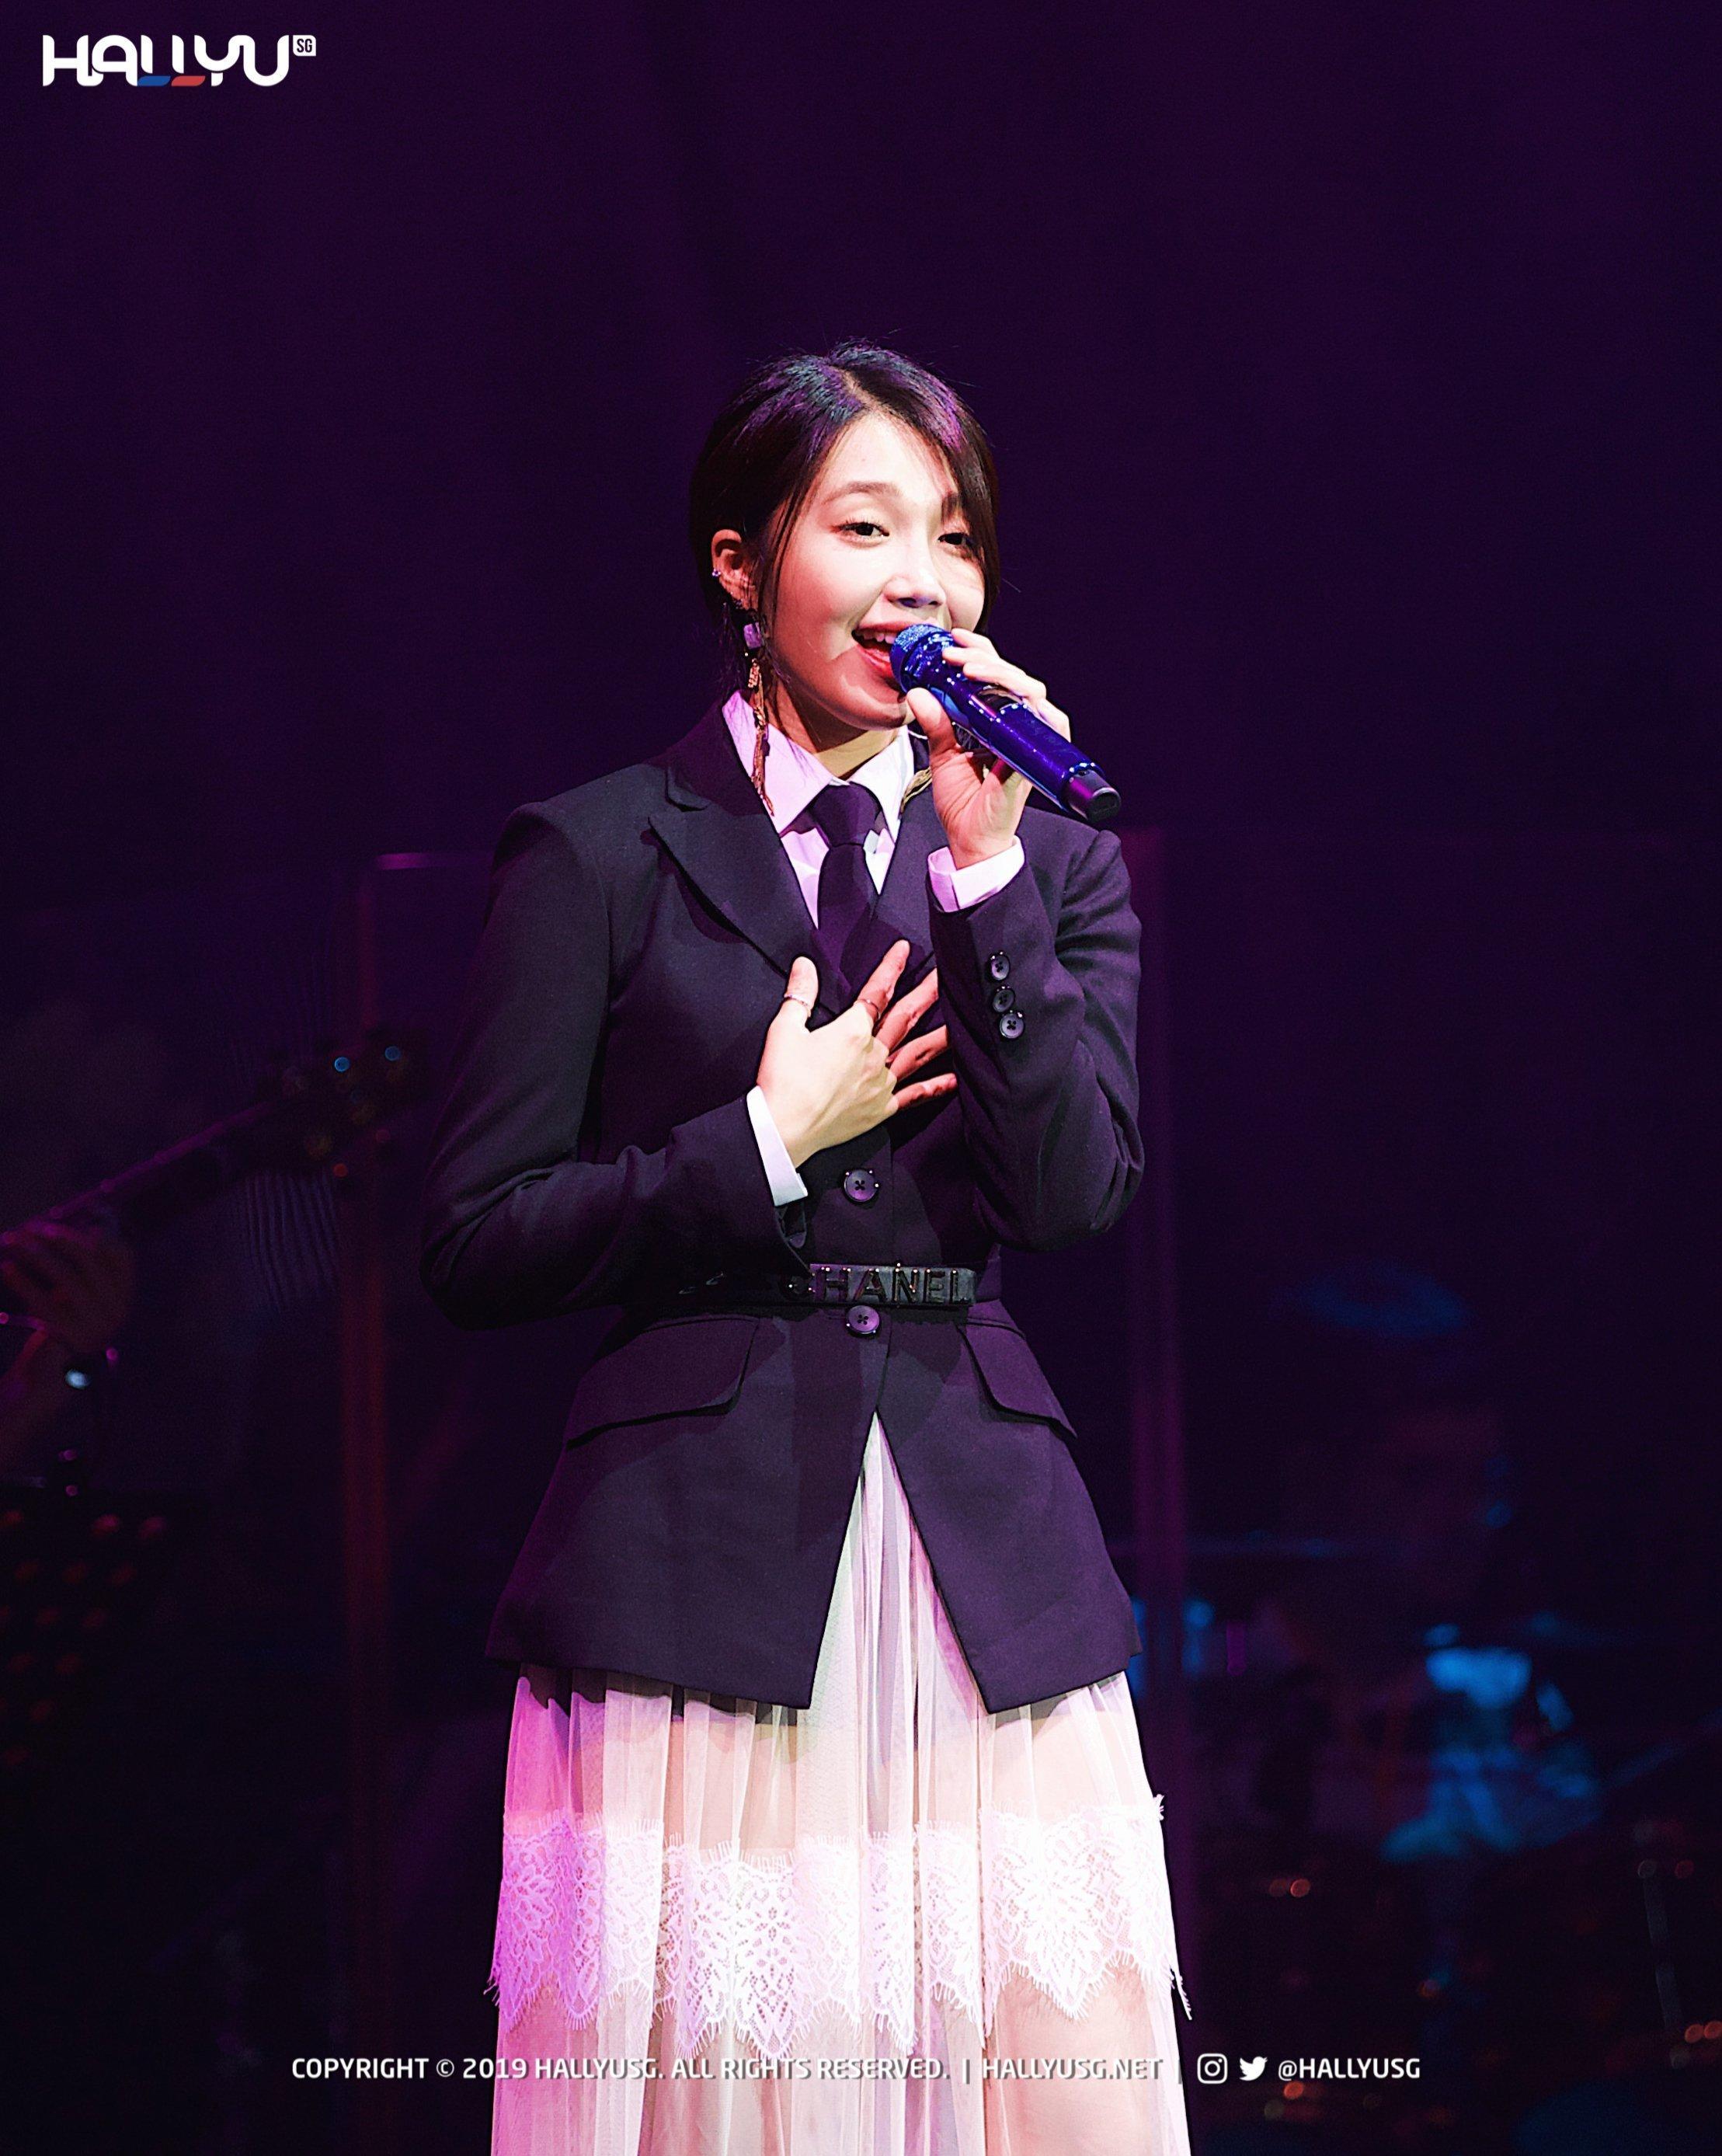 Jeong Eun-ji Talks About Going Through Different Life Stages